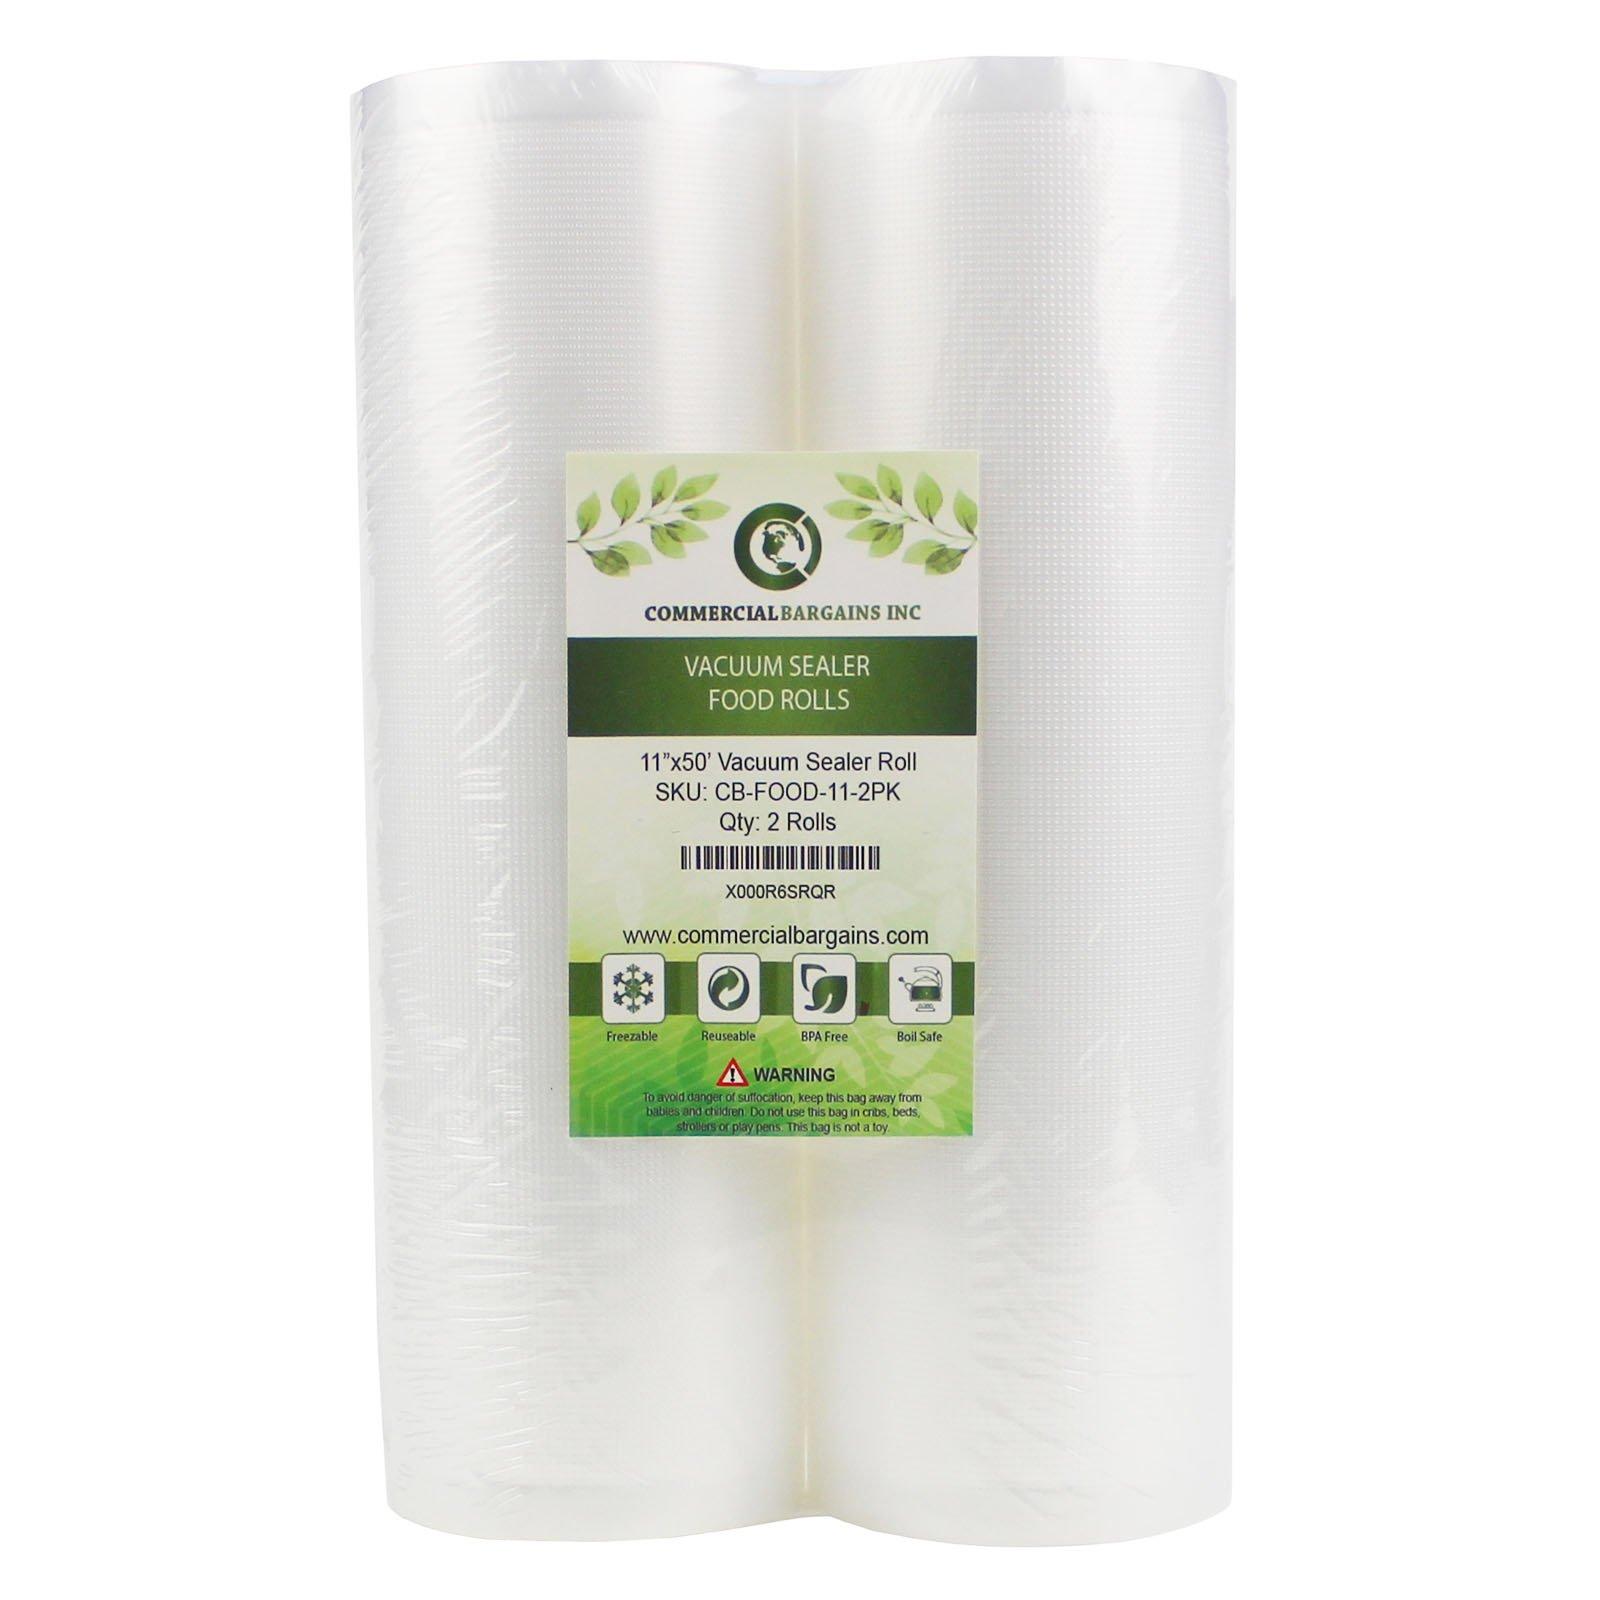 Commercial Bargains 2 Jumbo 11'' x 50' Commercial Vacuum Sealer Saver Bags Sous Vide Food Storage by Commercial Bargains (Image #2)